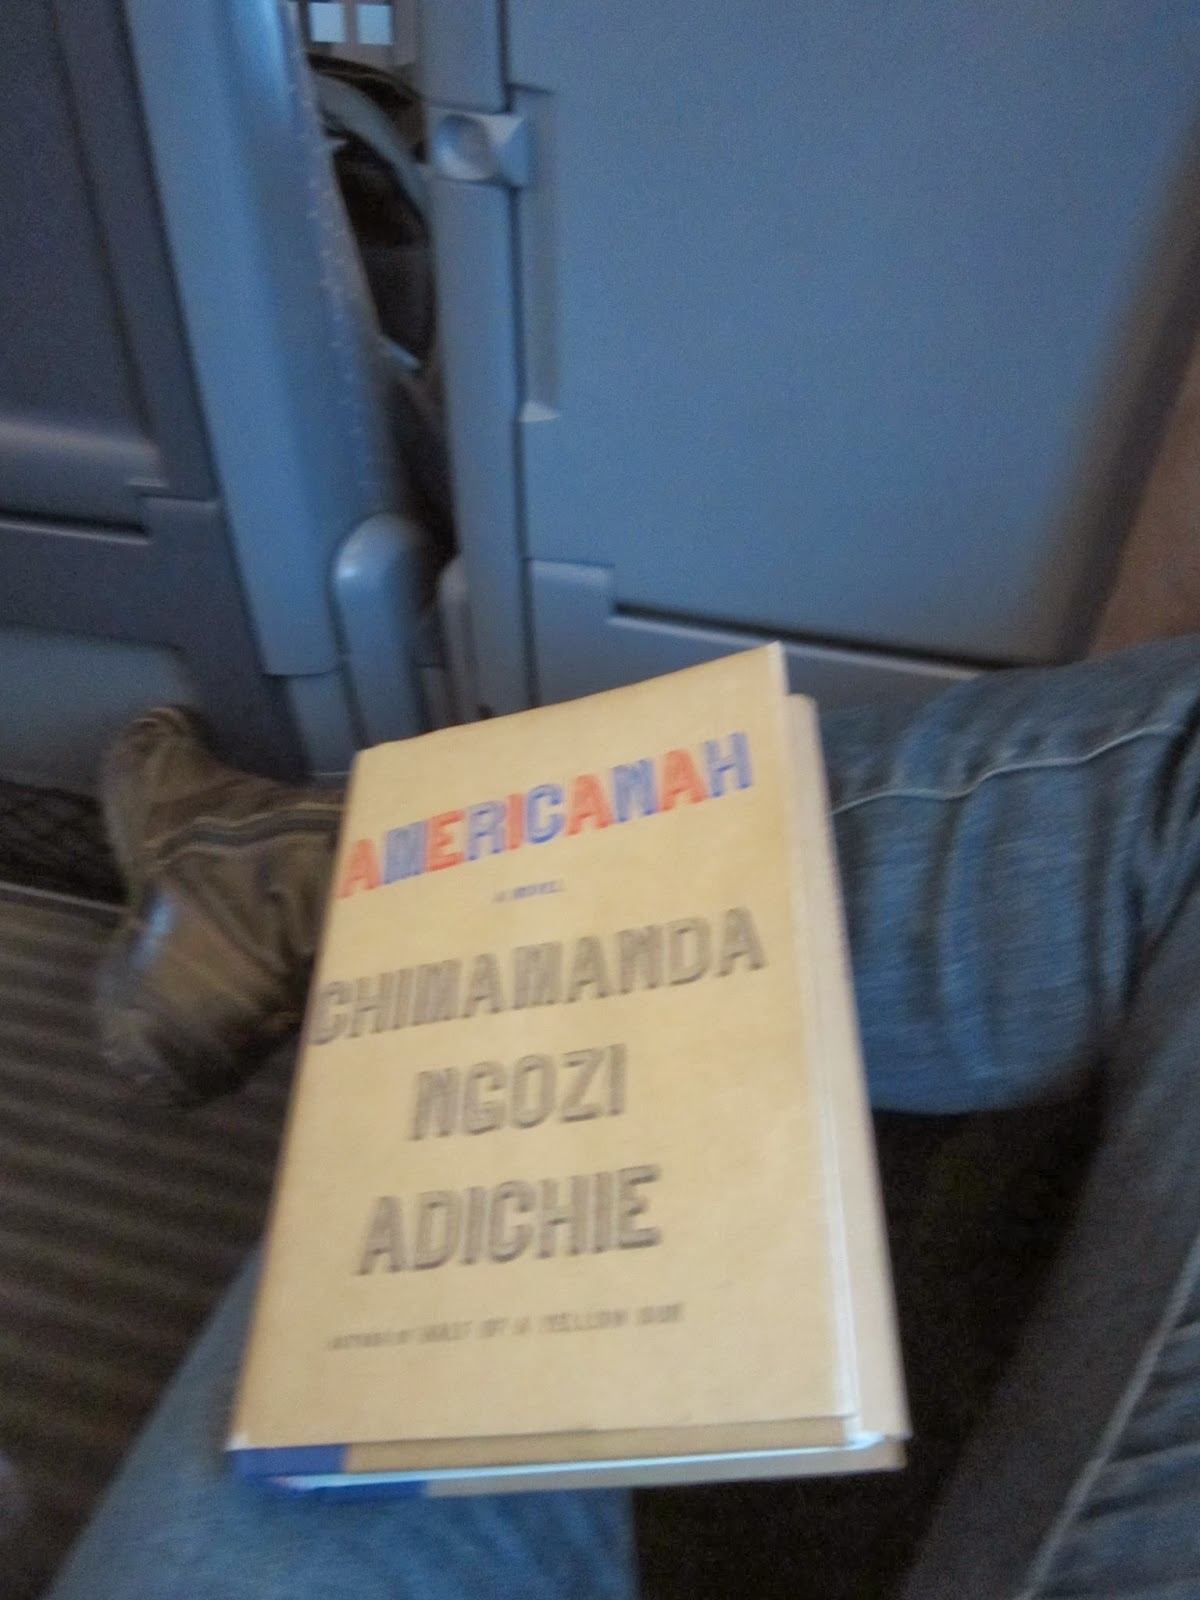 Americanah A Novel By Chimamanda Ngozi Adichie